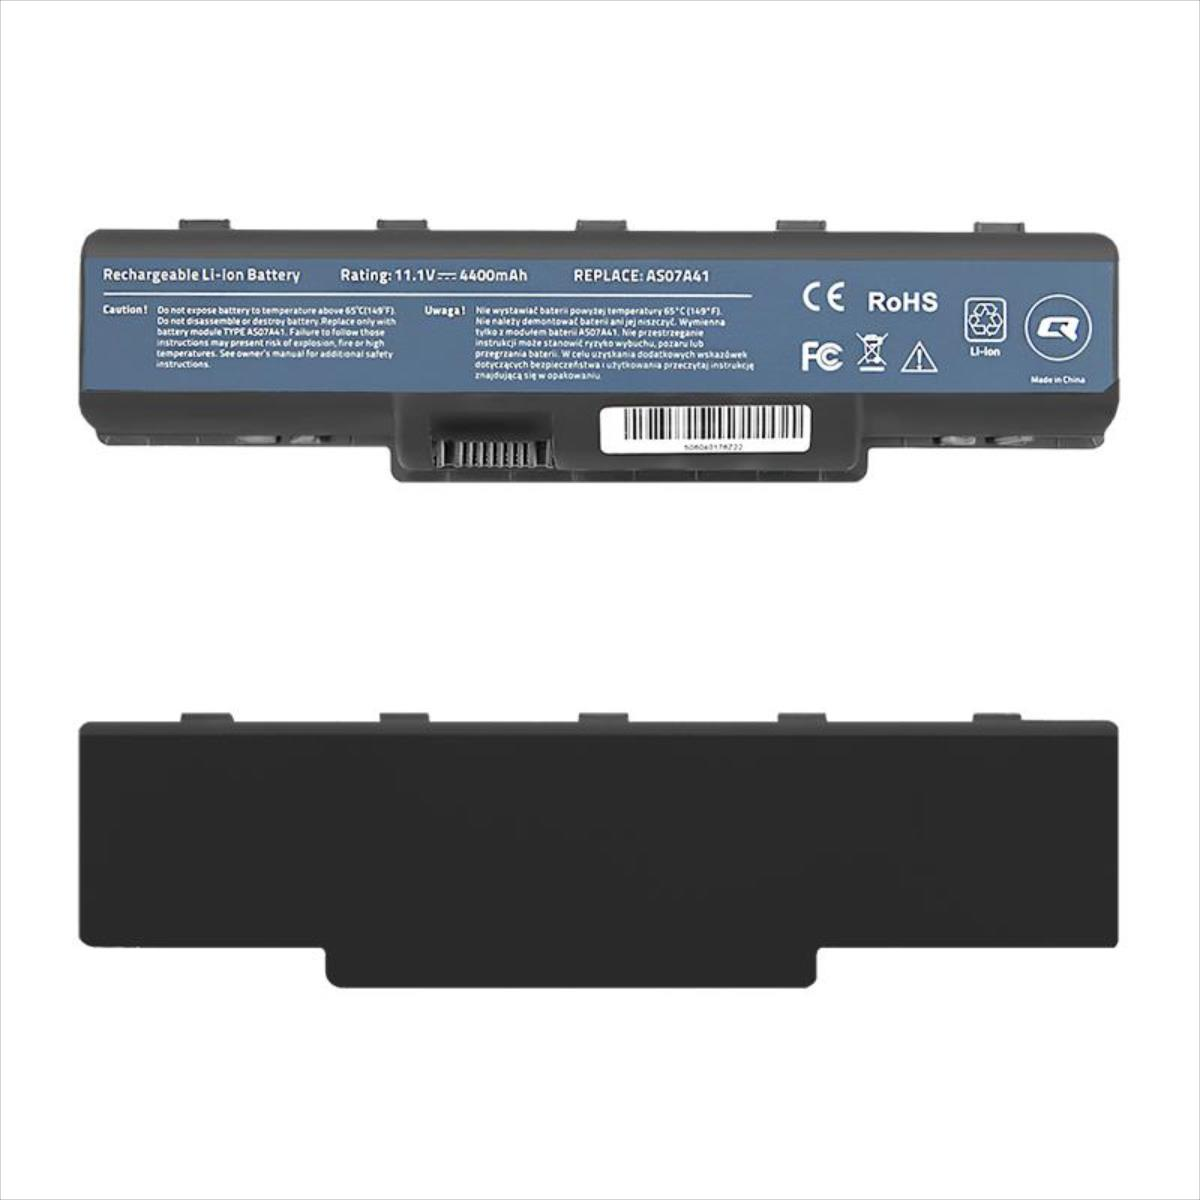 Qoltec Long Life Notebook Battery - Acer Aspire 4710 | 4400mAh | 10.8V akumulators, baterija portatīvajiem datoriem